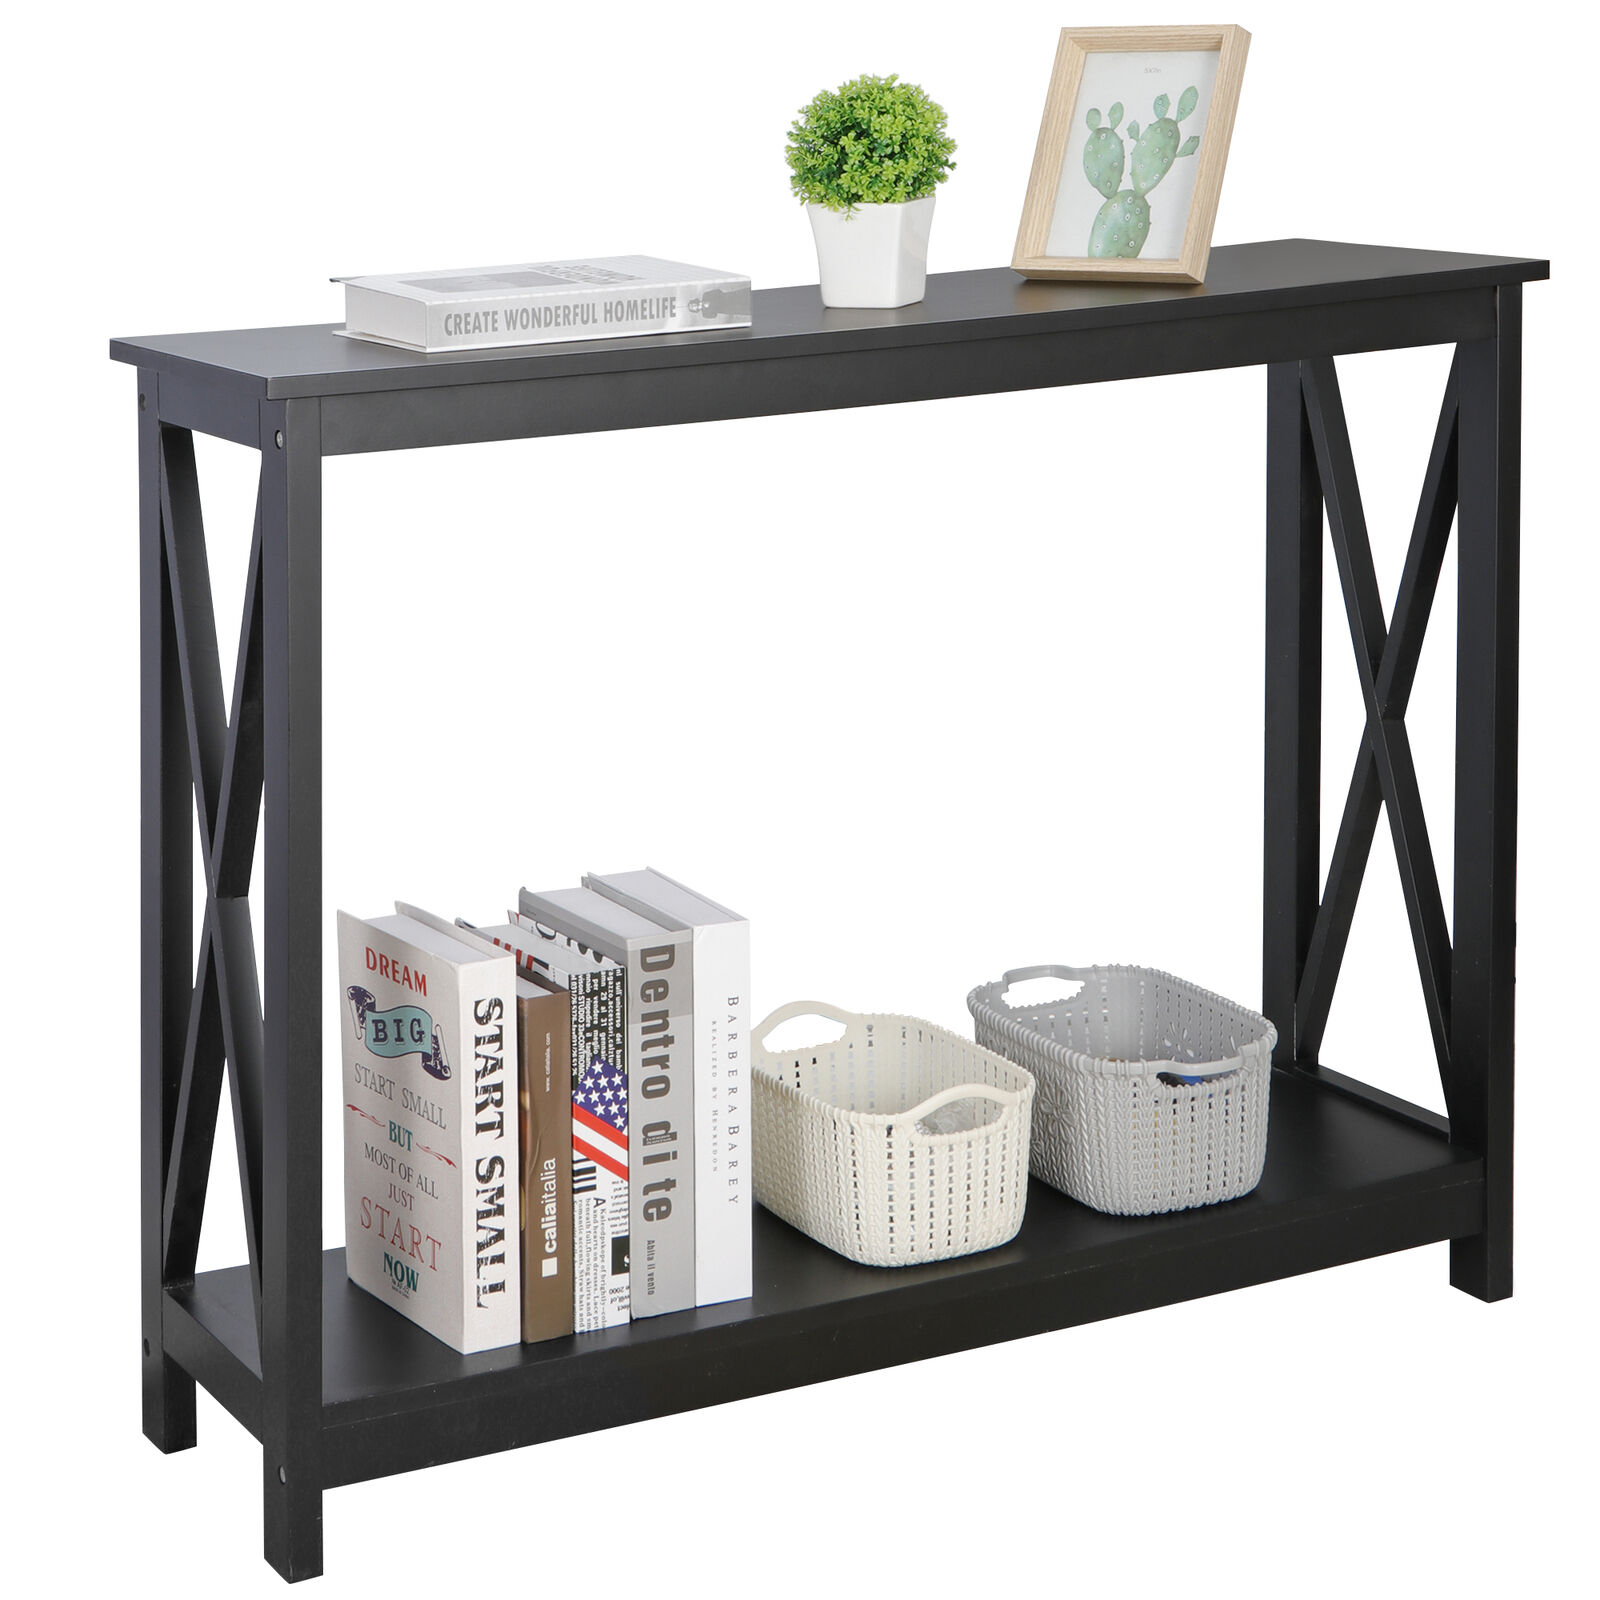 Console Table Modern Accent Side Stand Sofa Espresso Display Storage Shelf Furniture